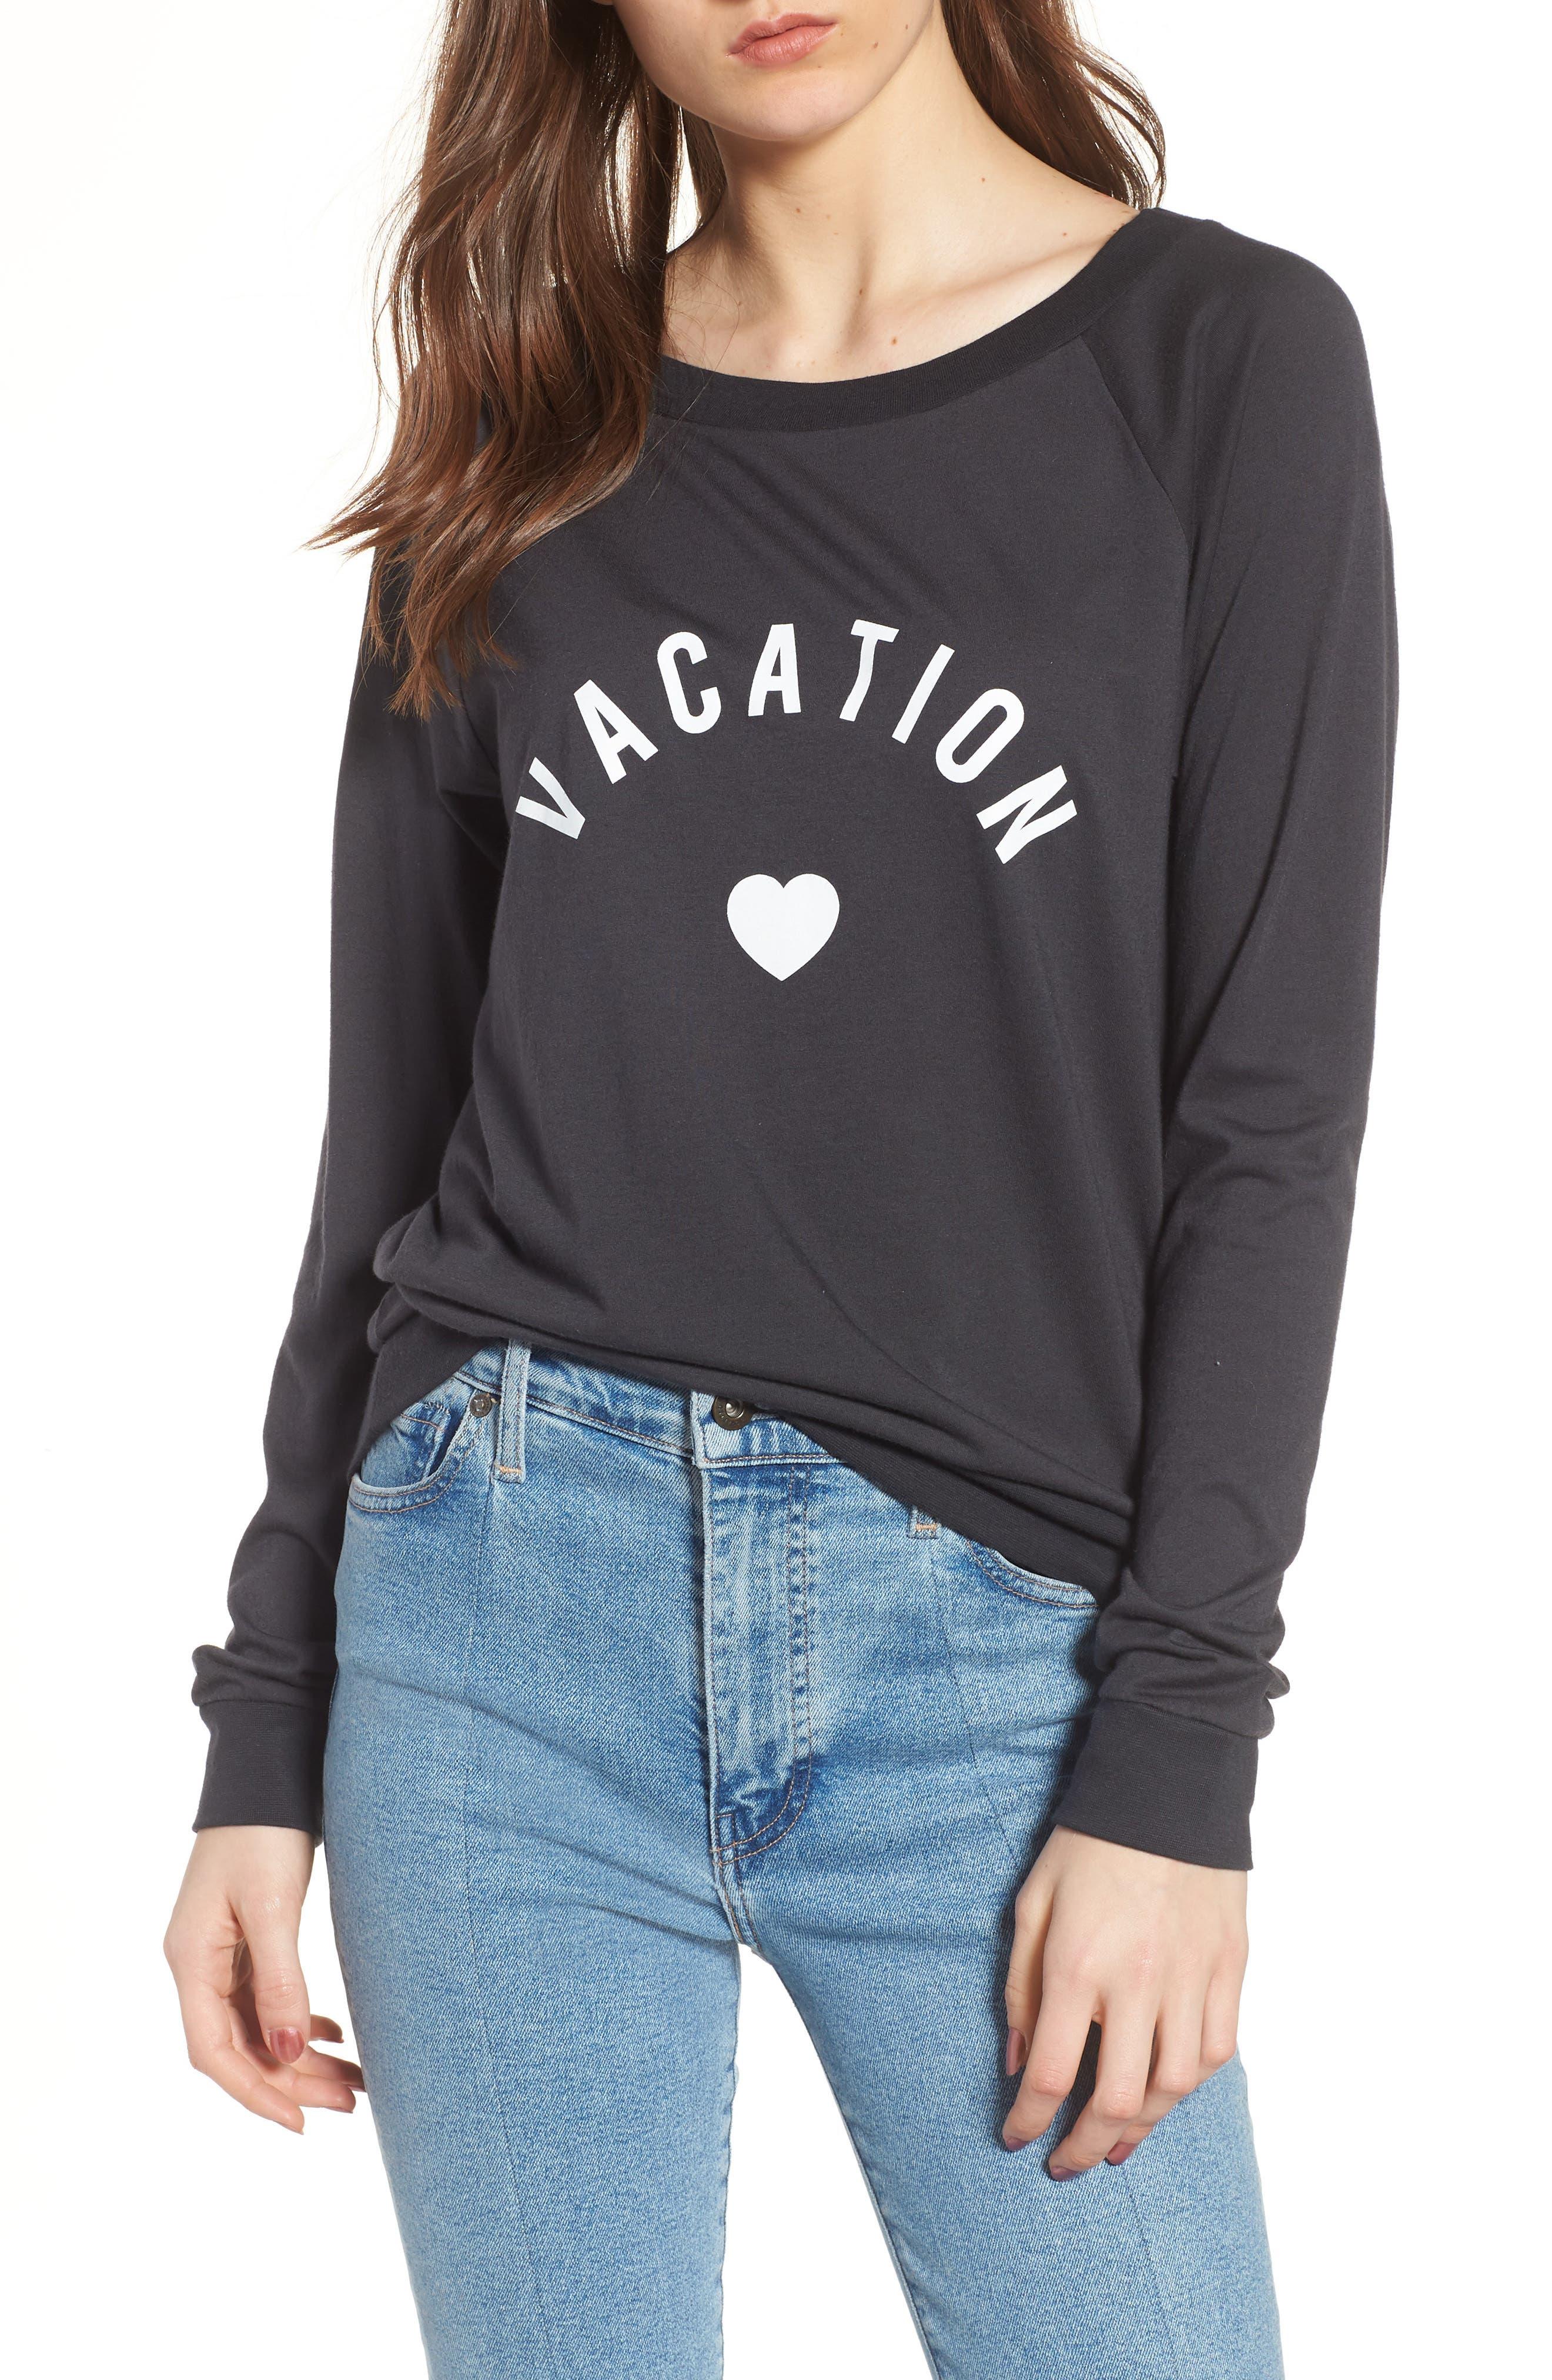 Candy - Vacation Pullover,                             Main thumbnail 1, color,                             Black